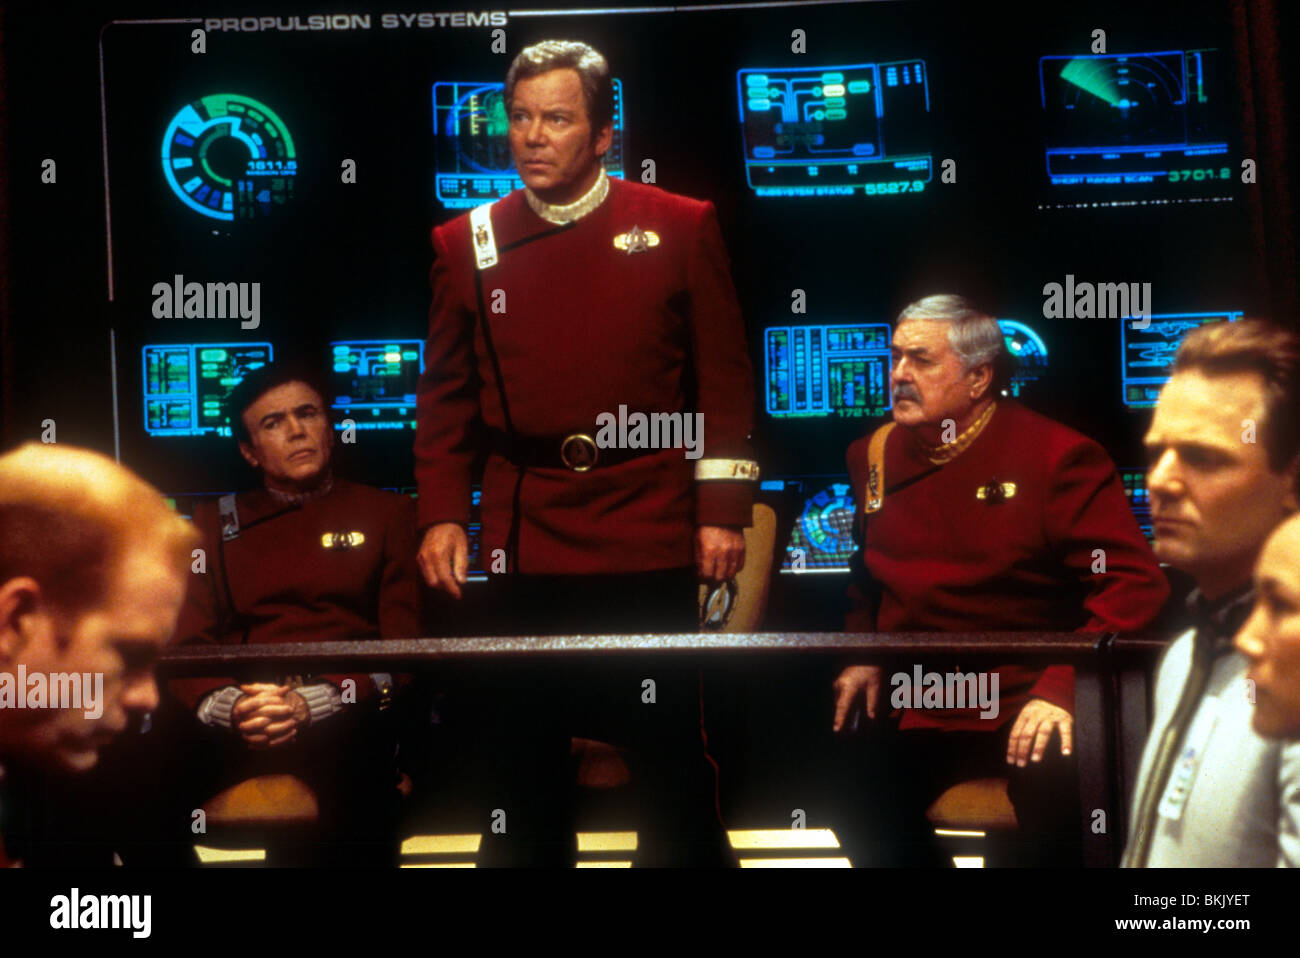 STAR TREK: GENERATIONS (1994) WALTER KOENIG, WILLIAM SHATNER, JAMES DOOHAN STGN 077 - Stock Image